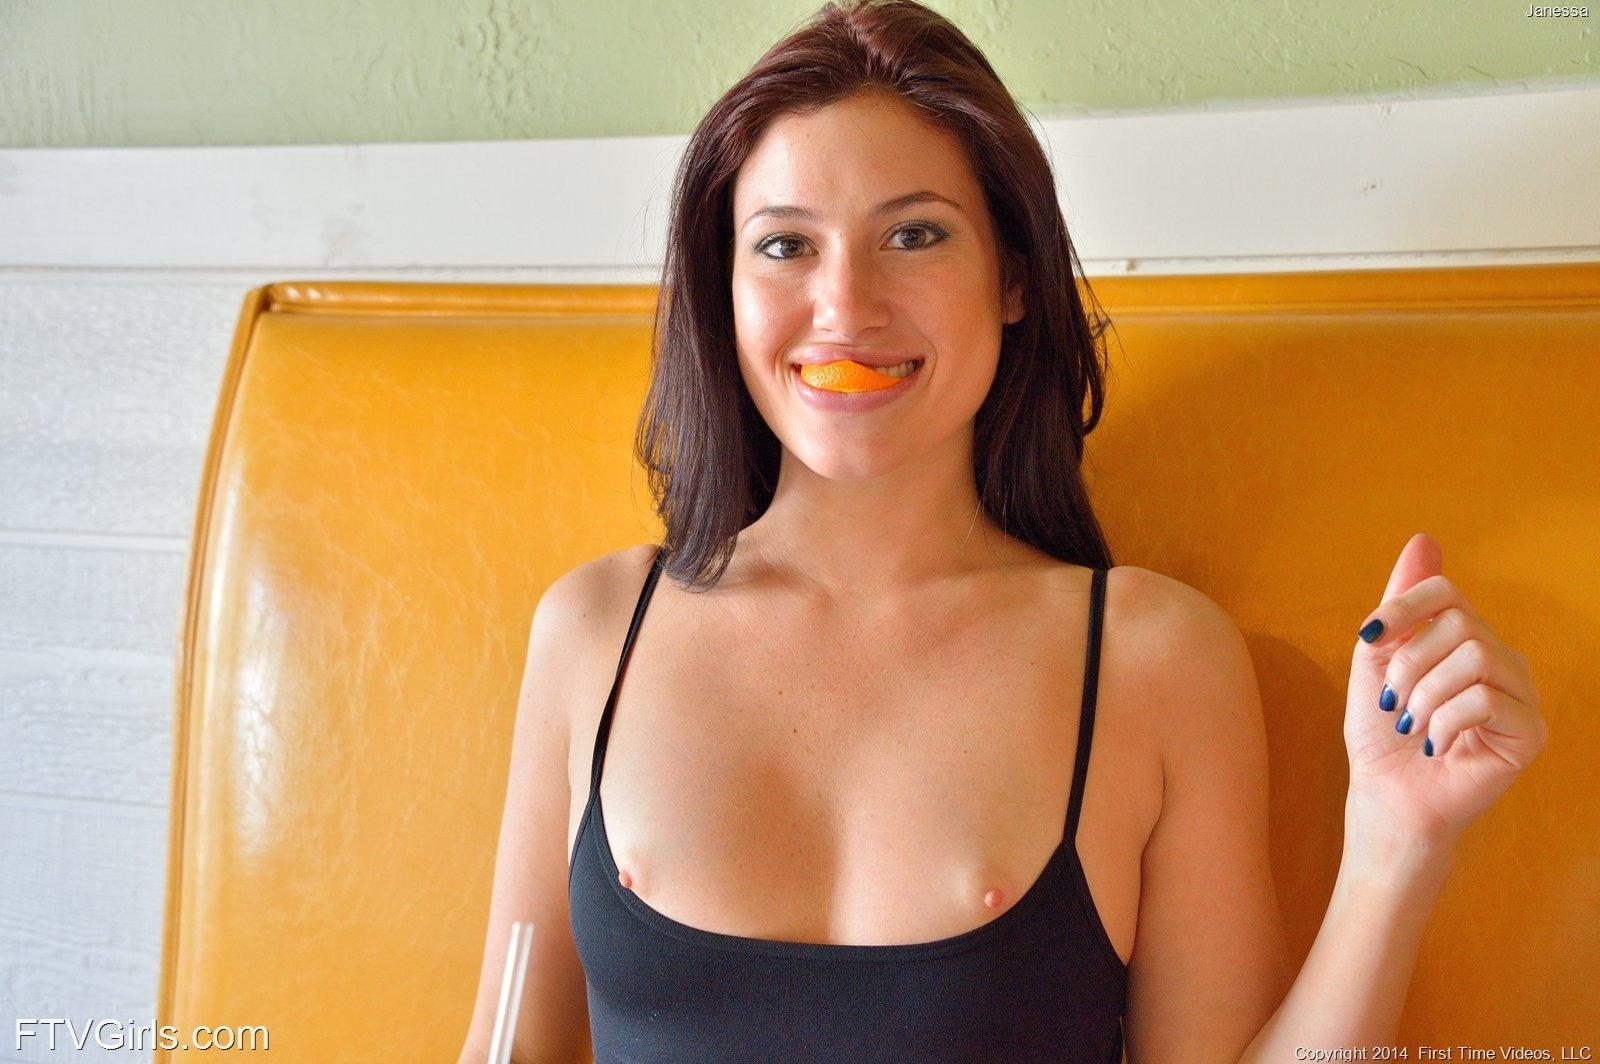 Healthy nude girls #11